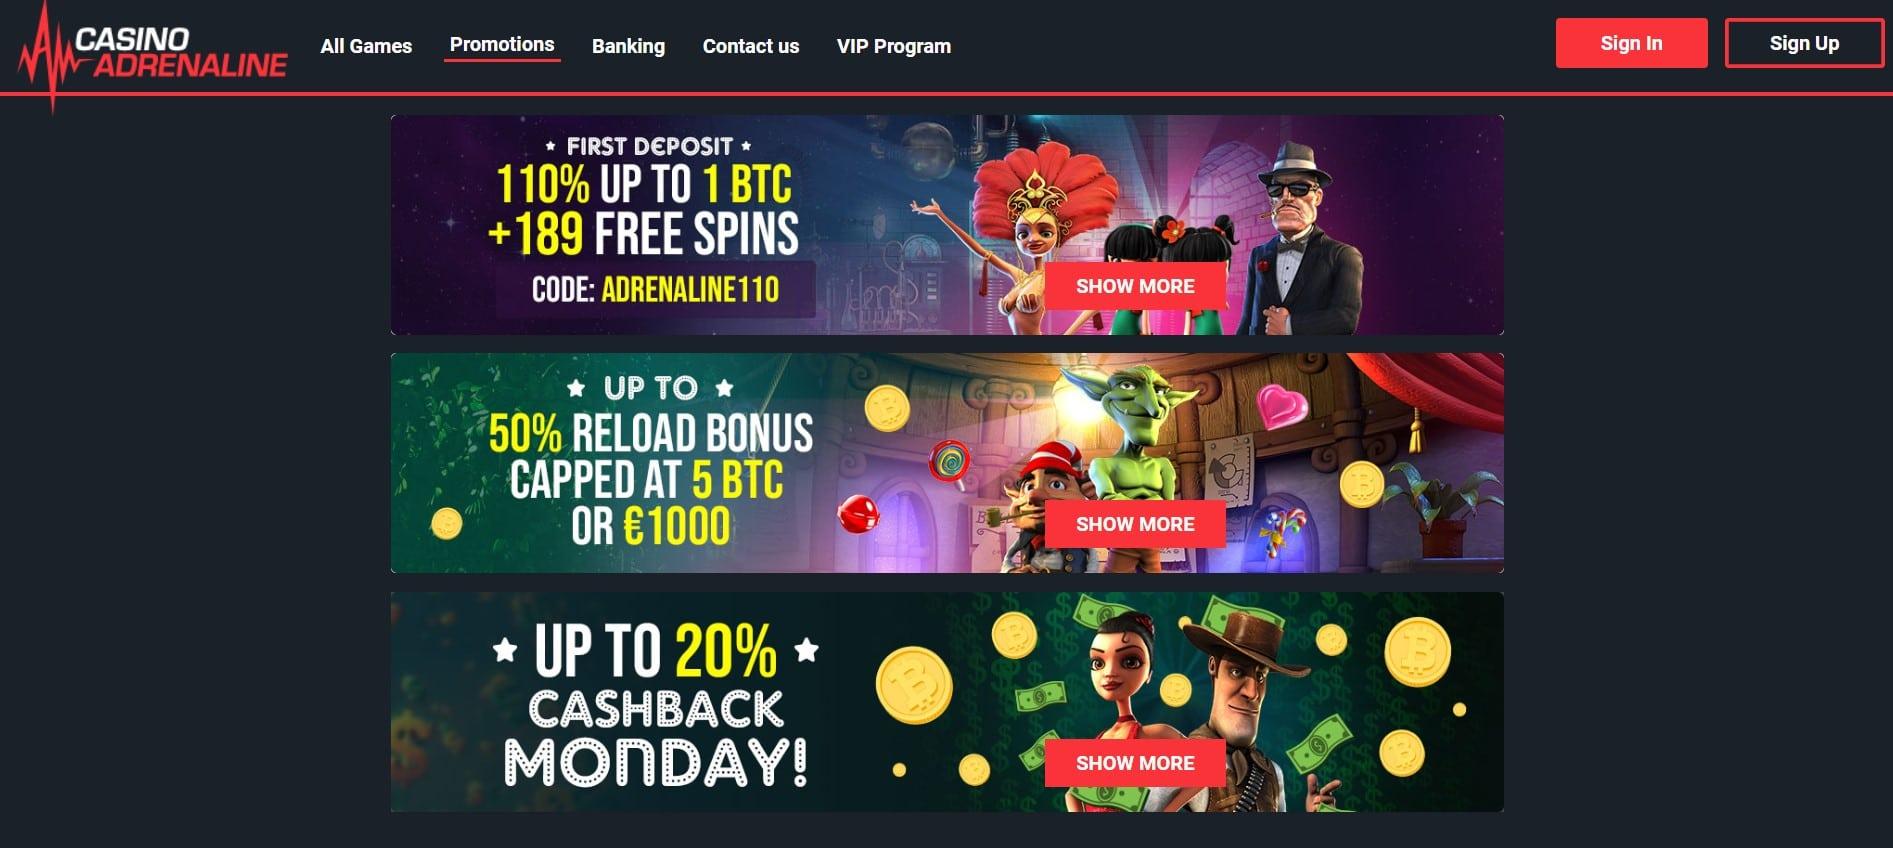 Adrenaline Casino Review